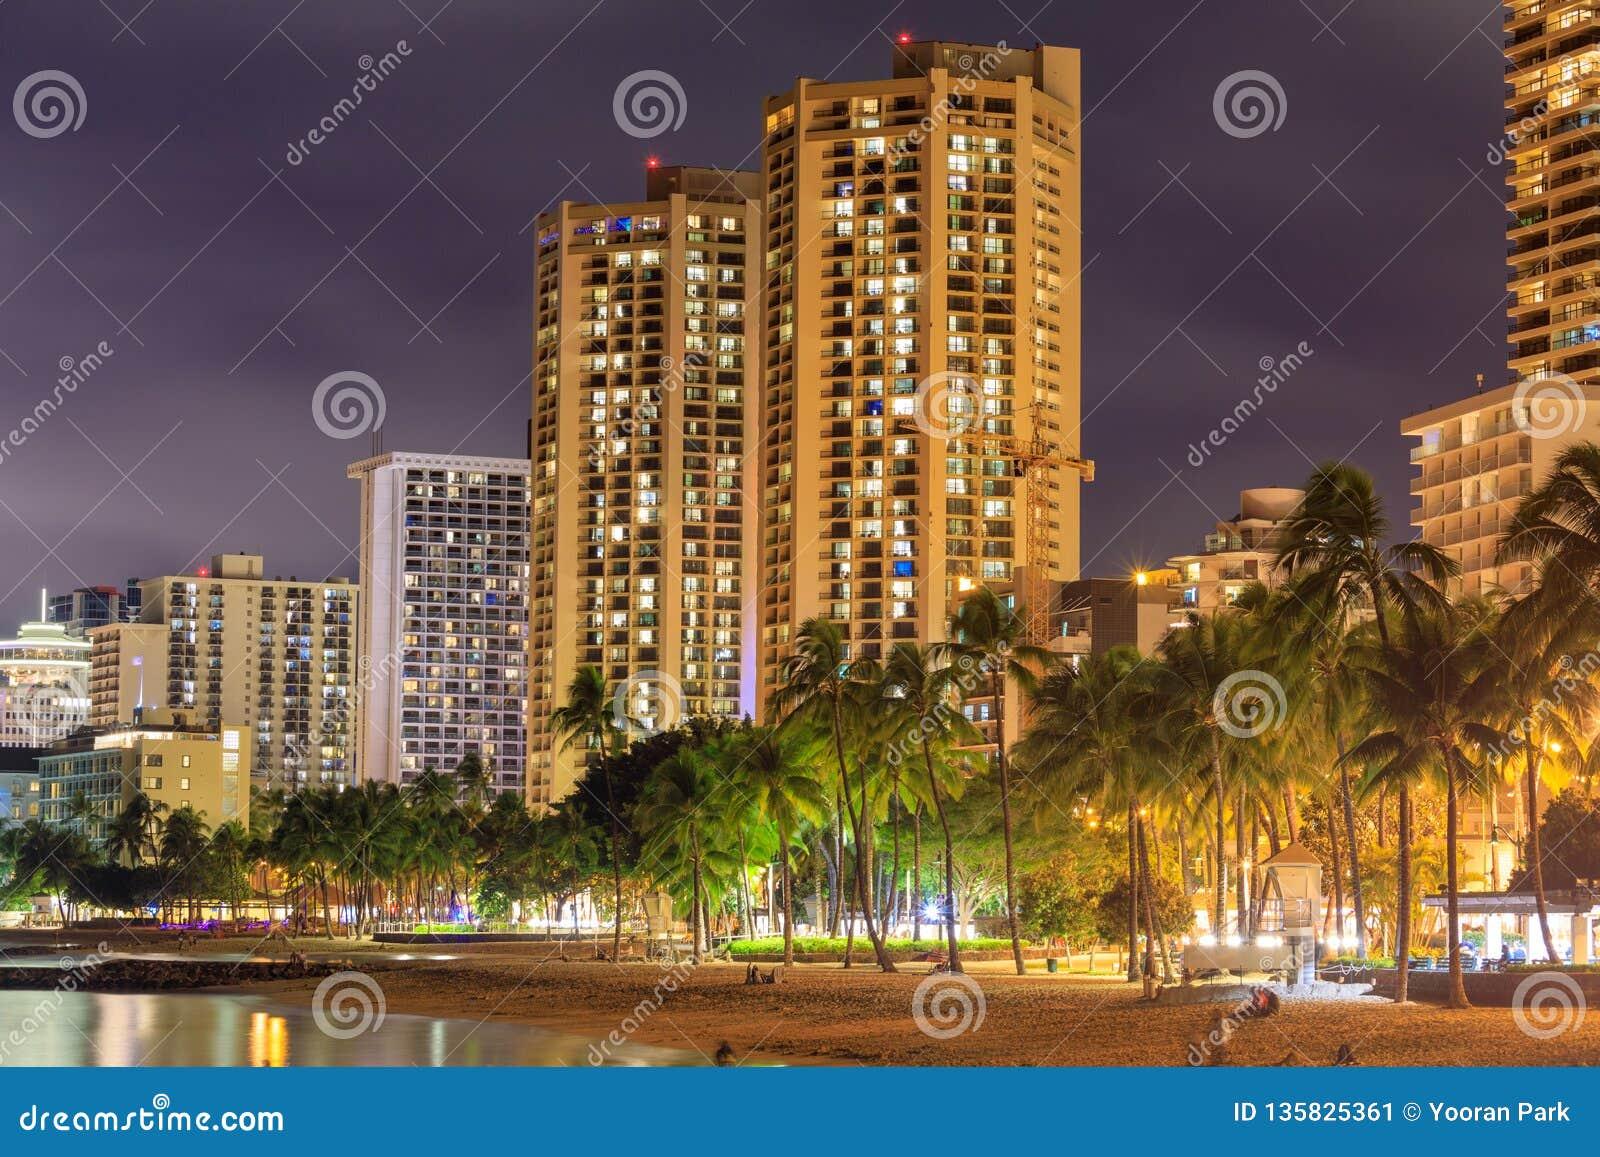 Honolulu Skyline With Waikiki Beach Hotels Building At